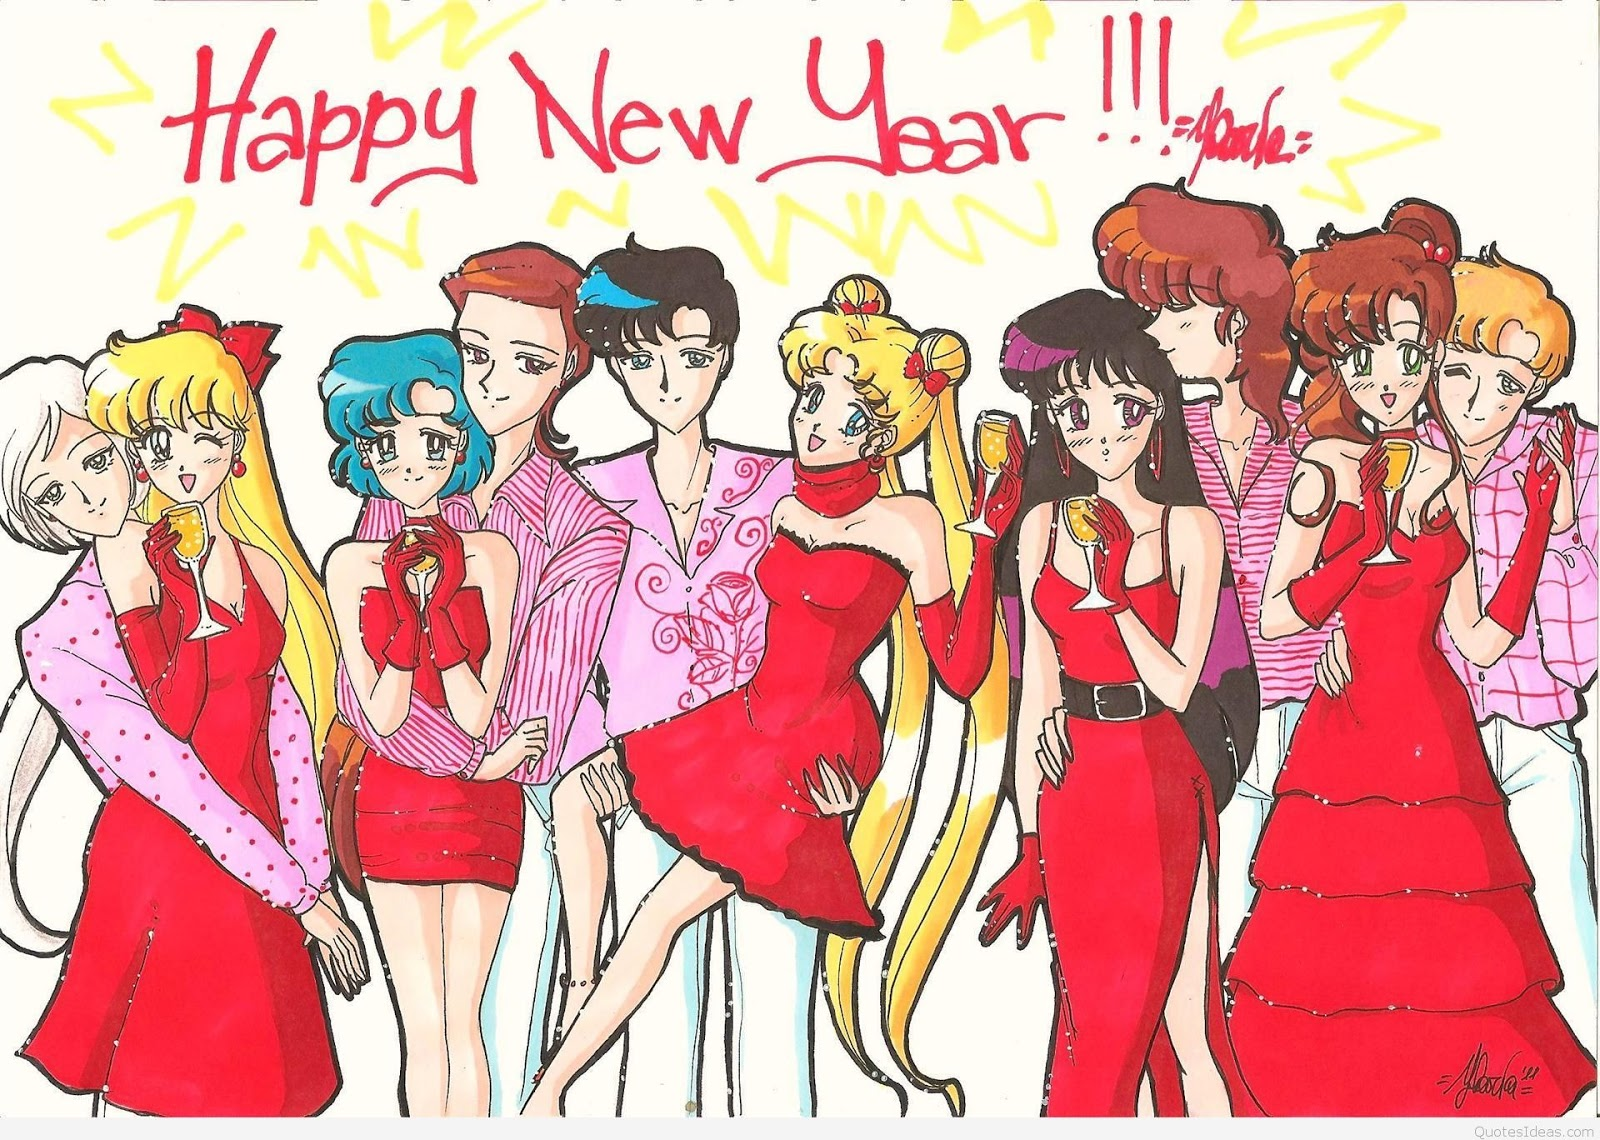 happy new year 2017 cartoon images happy new year 2018 1600x1140